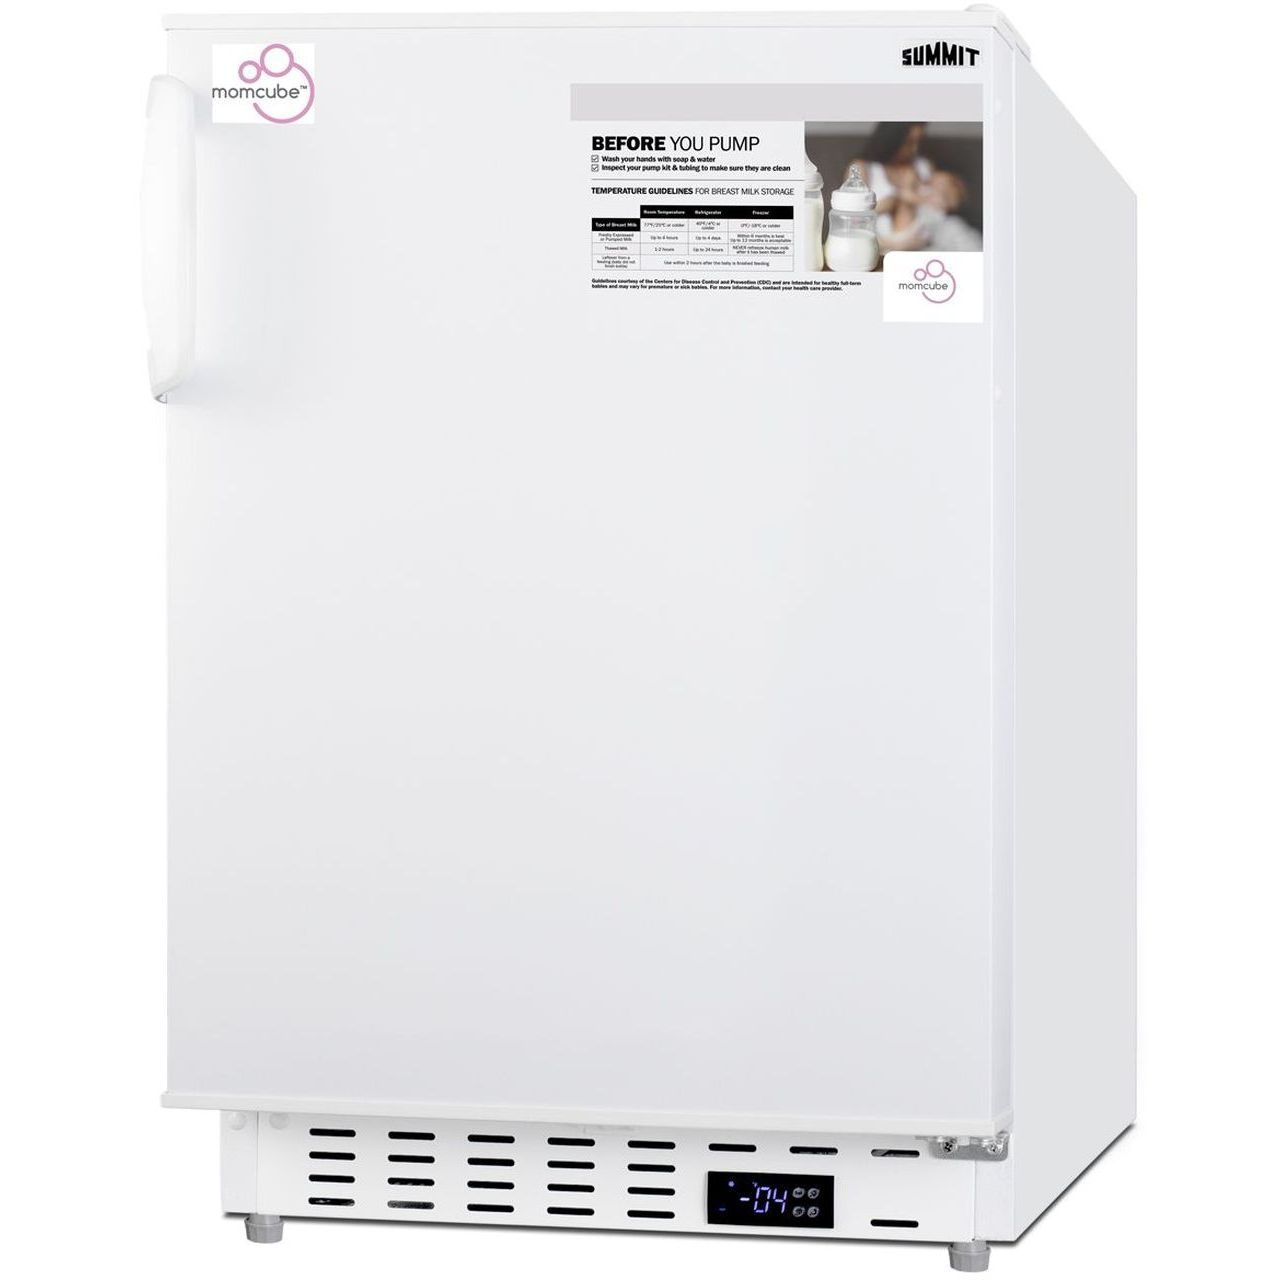 "Summit 20"" Built-In MOMCUBE All-Freezer ADA Compliant"